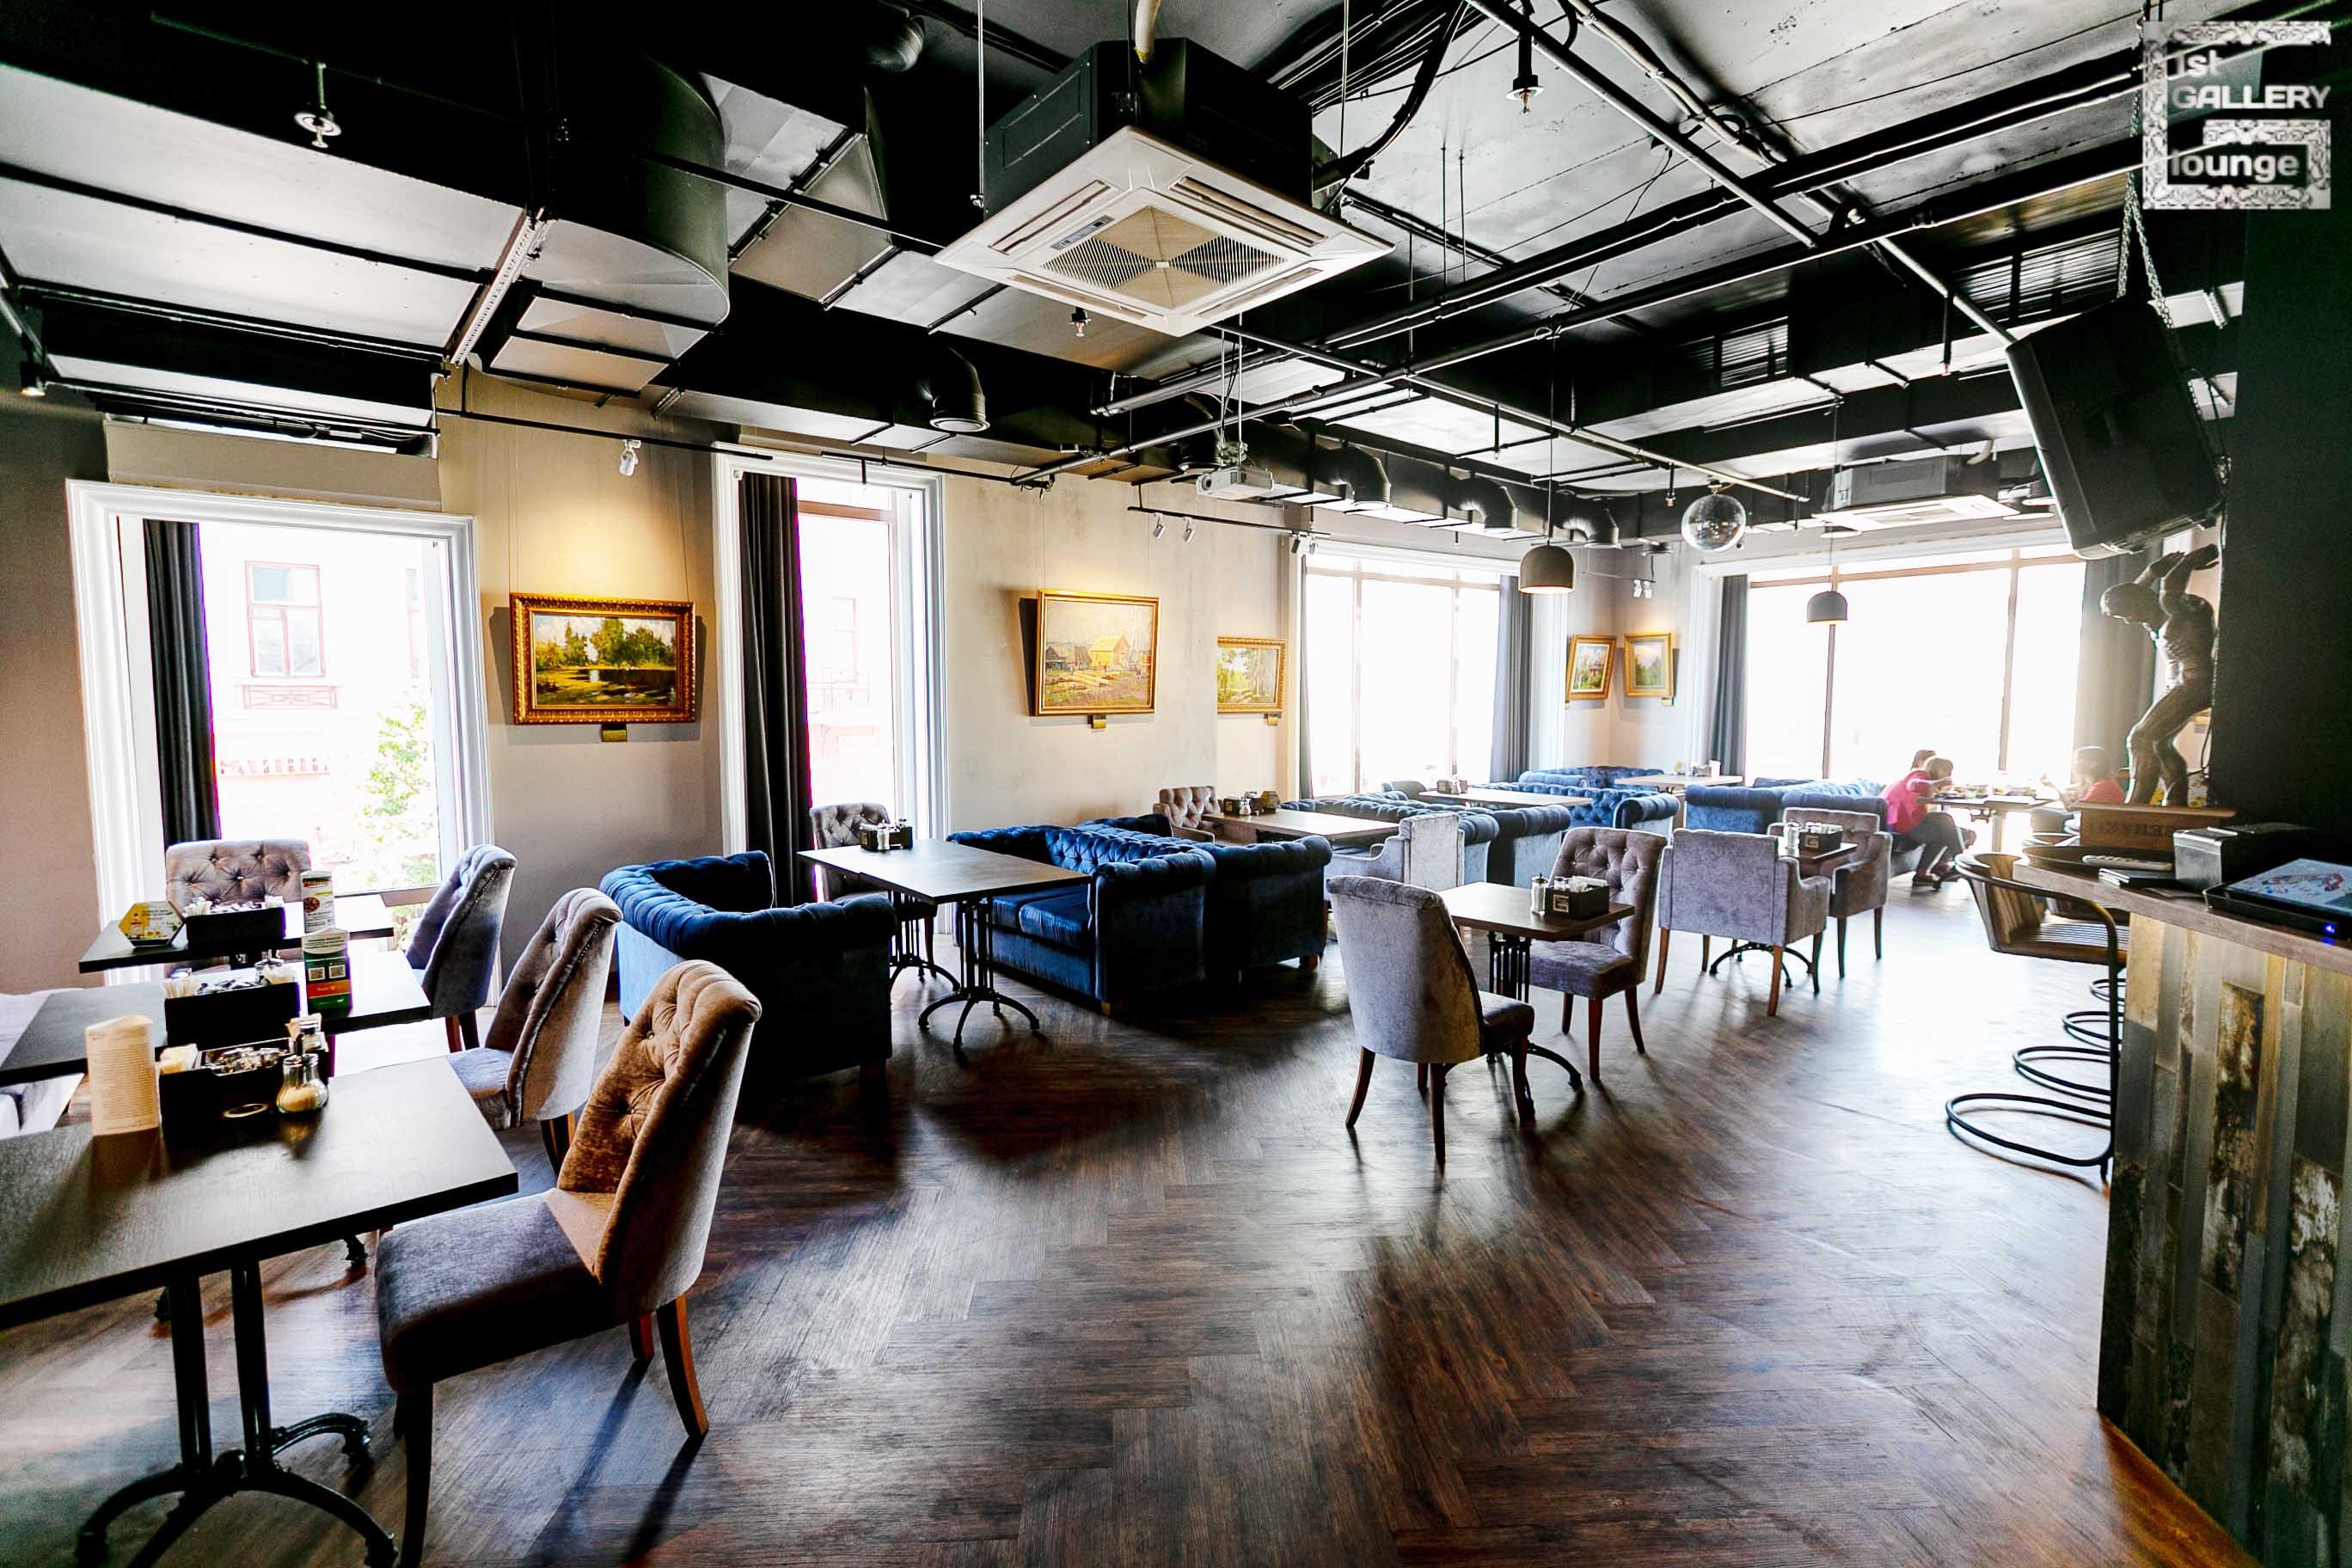 1st GALLERY lounge на ул. Баумана в Казани